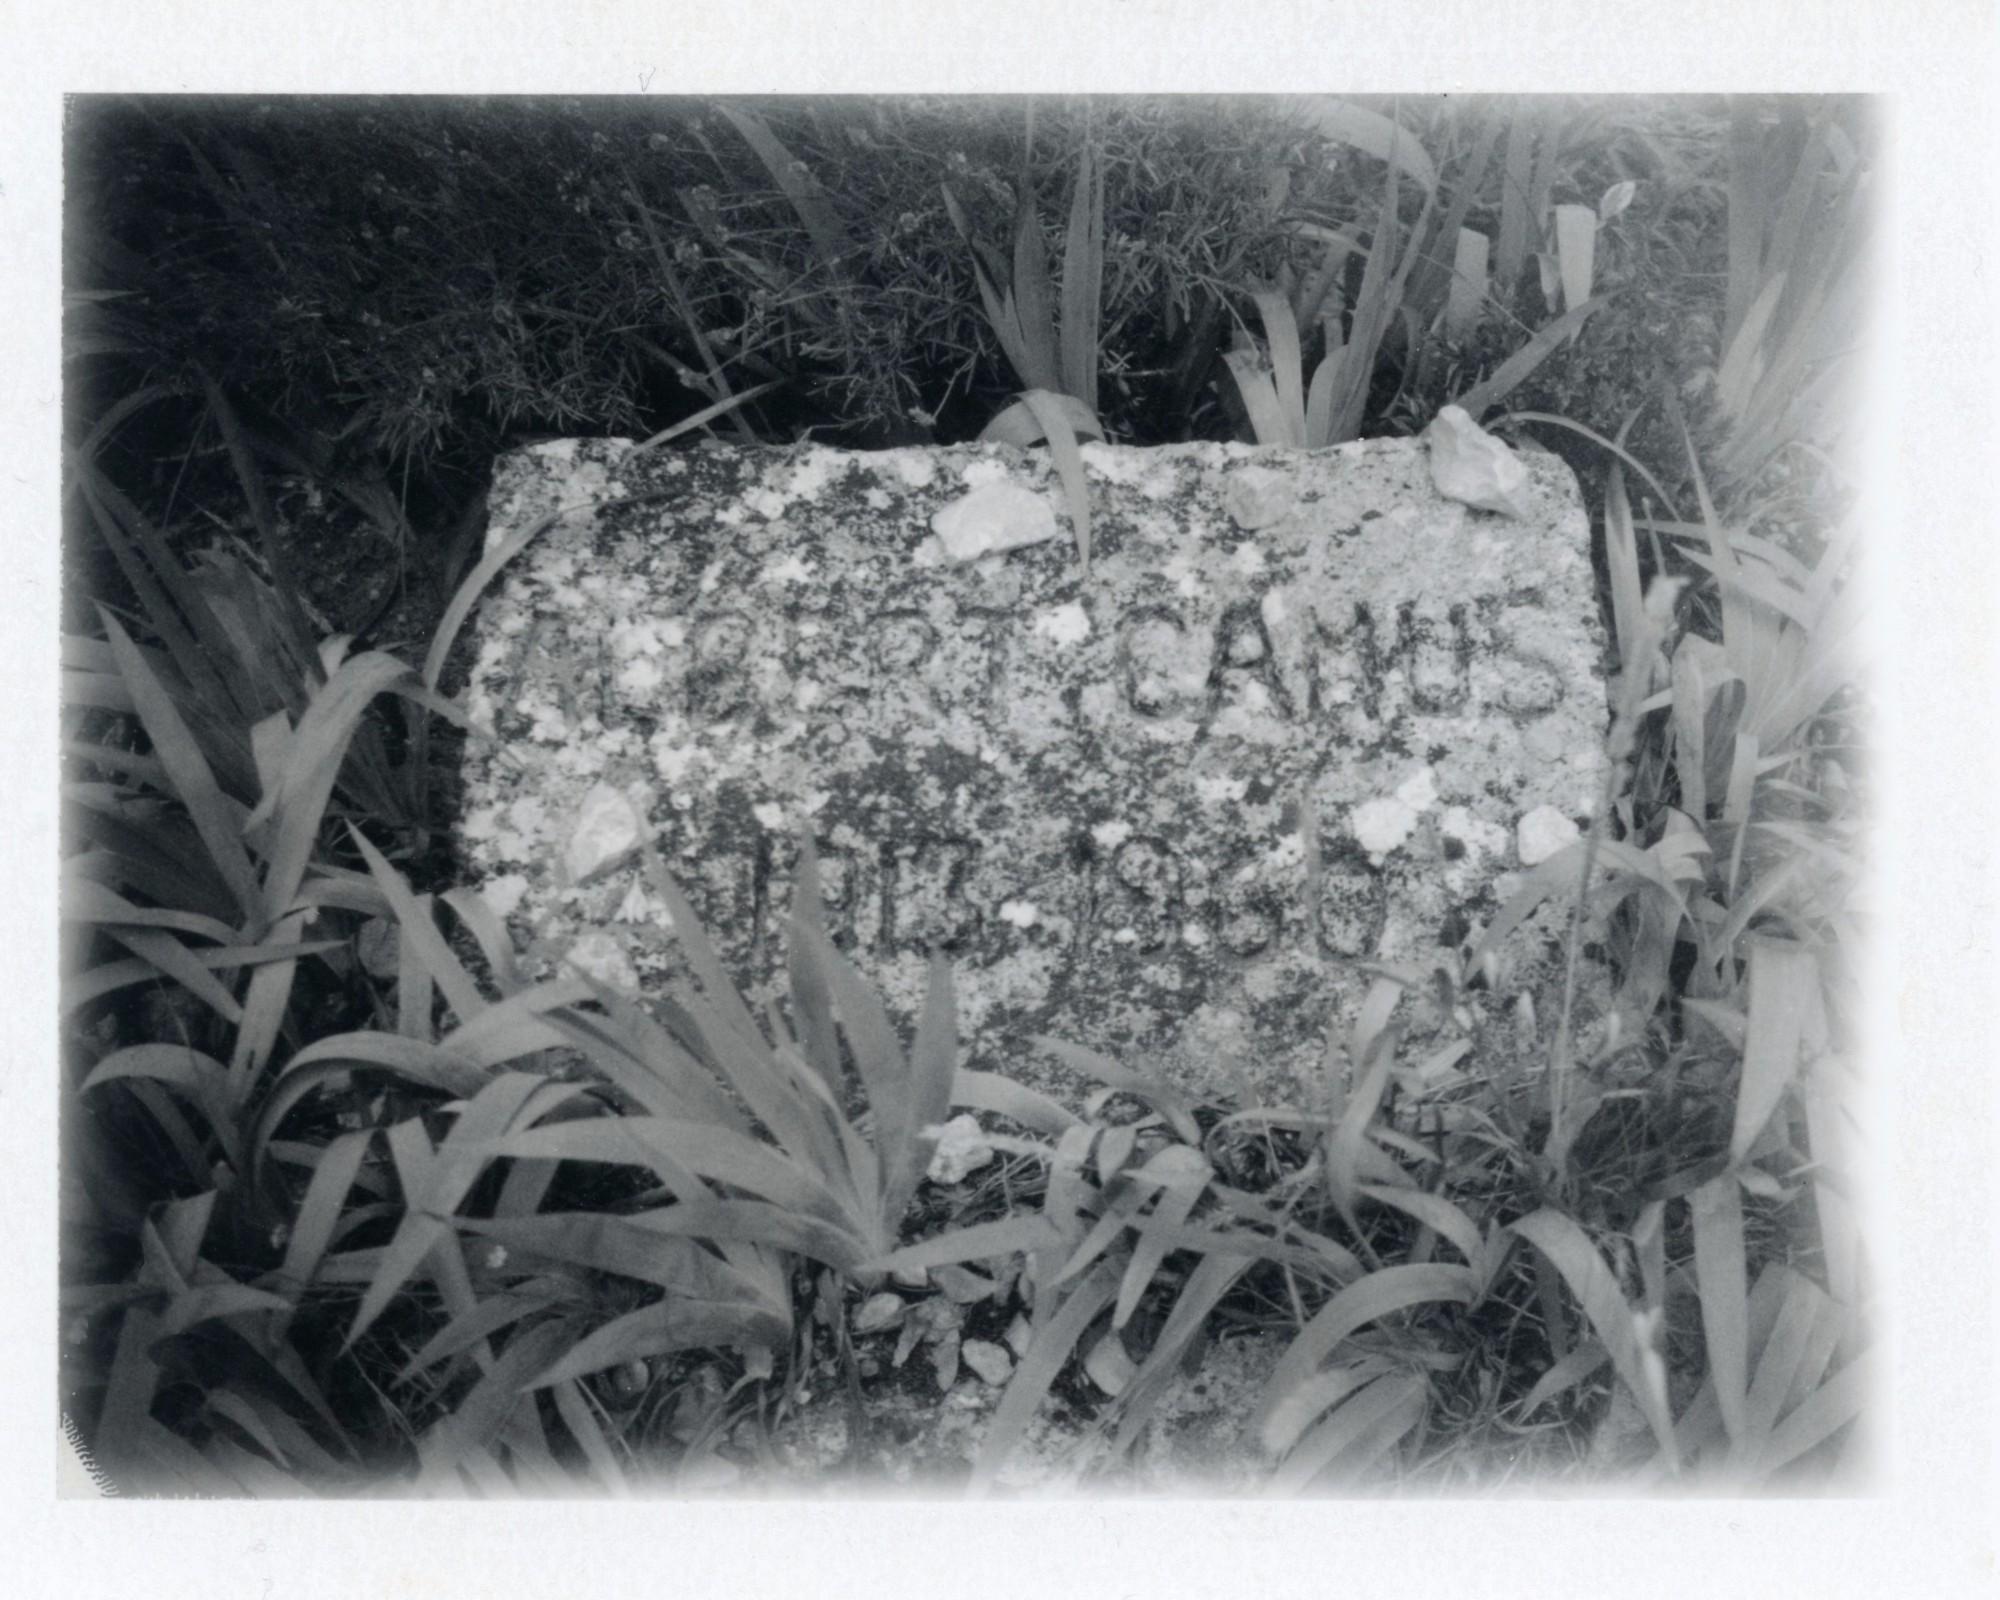 Patti Smith, 'Grave of Albert Camus', 2016 © Patti Smith, courtesy Gagosian, work exhibited by: GAGOSIAN